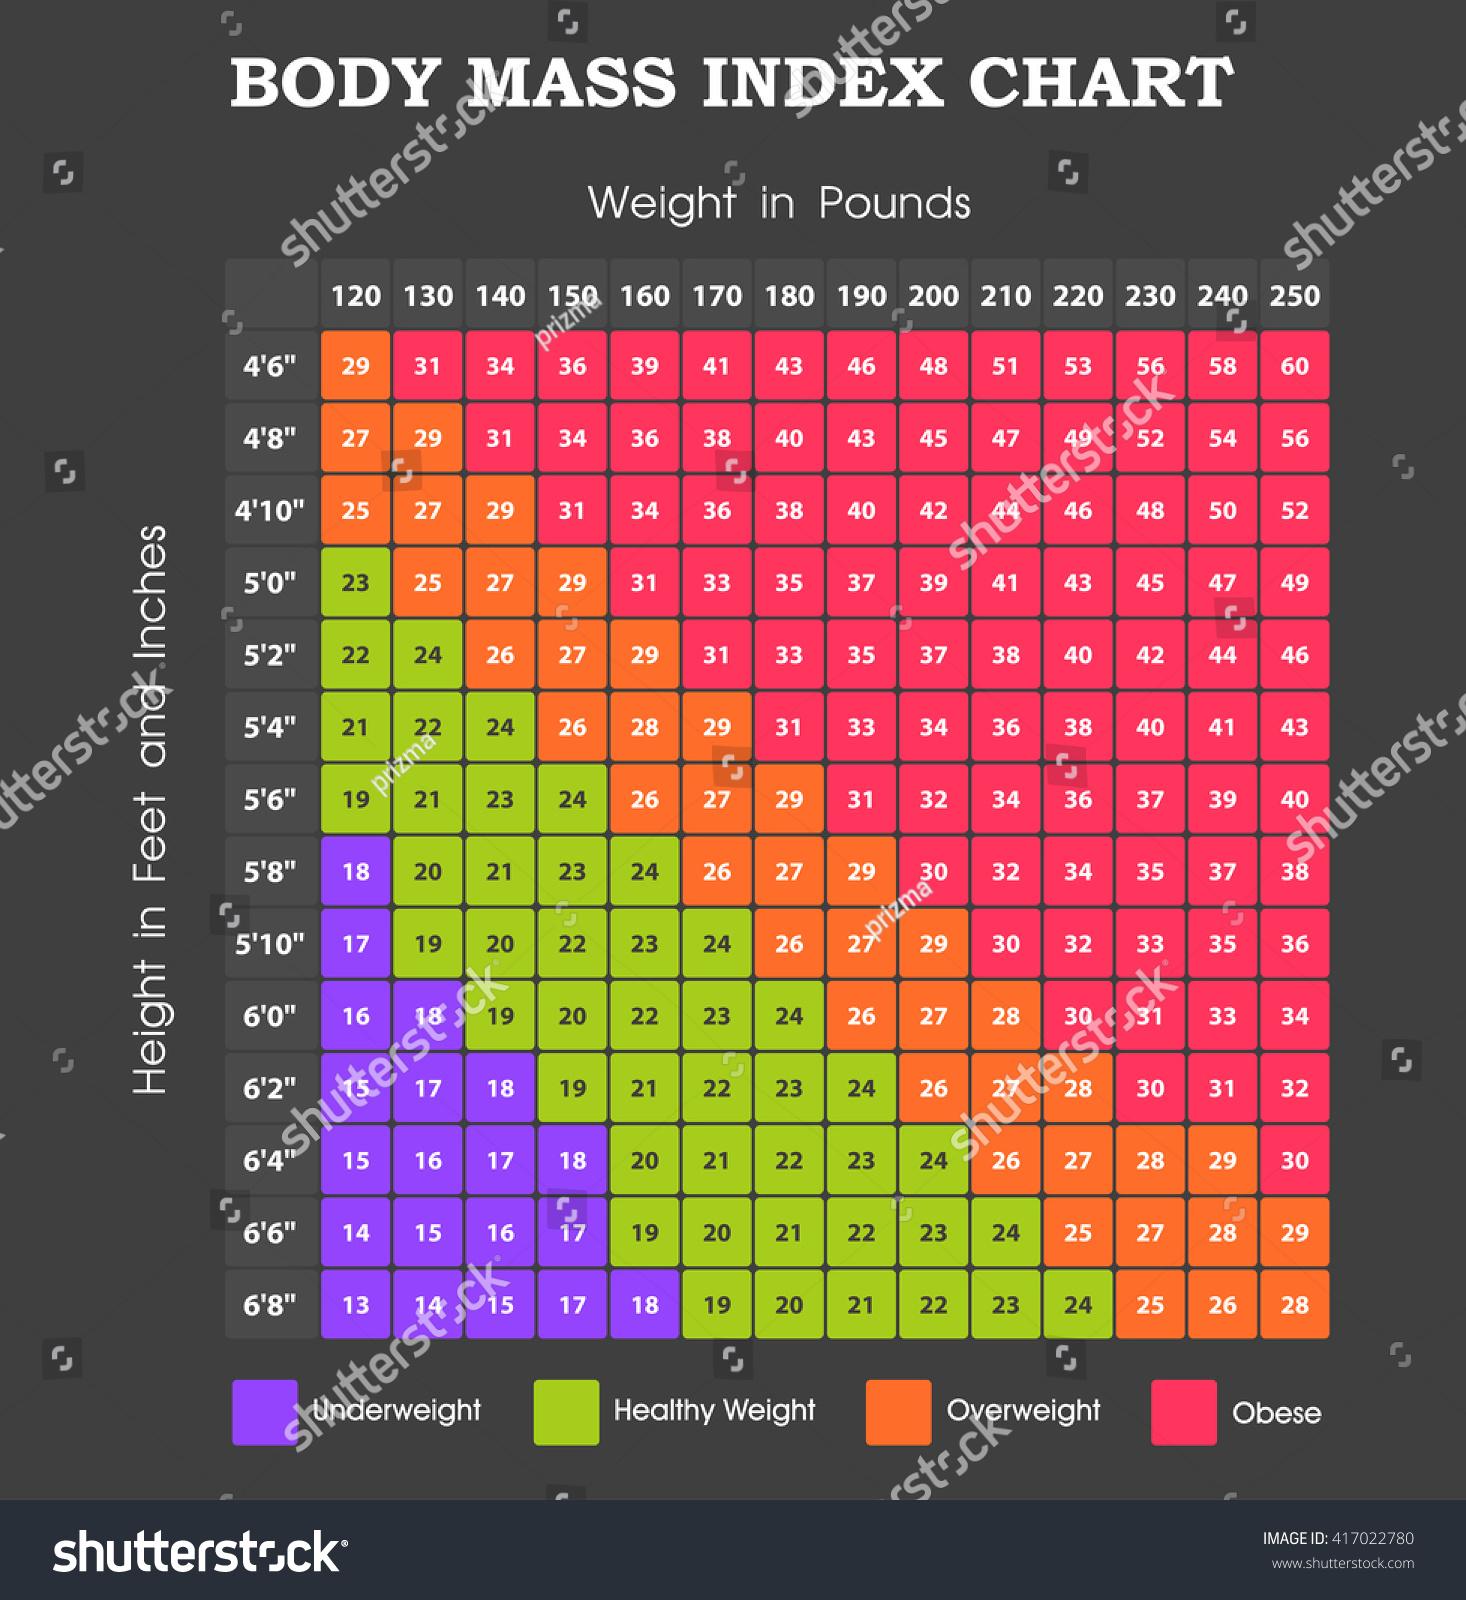 Body Mass Index Chart Height Weight Vector 417022780 – Bmi Index Chart Template